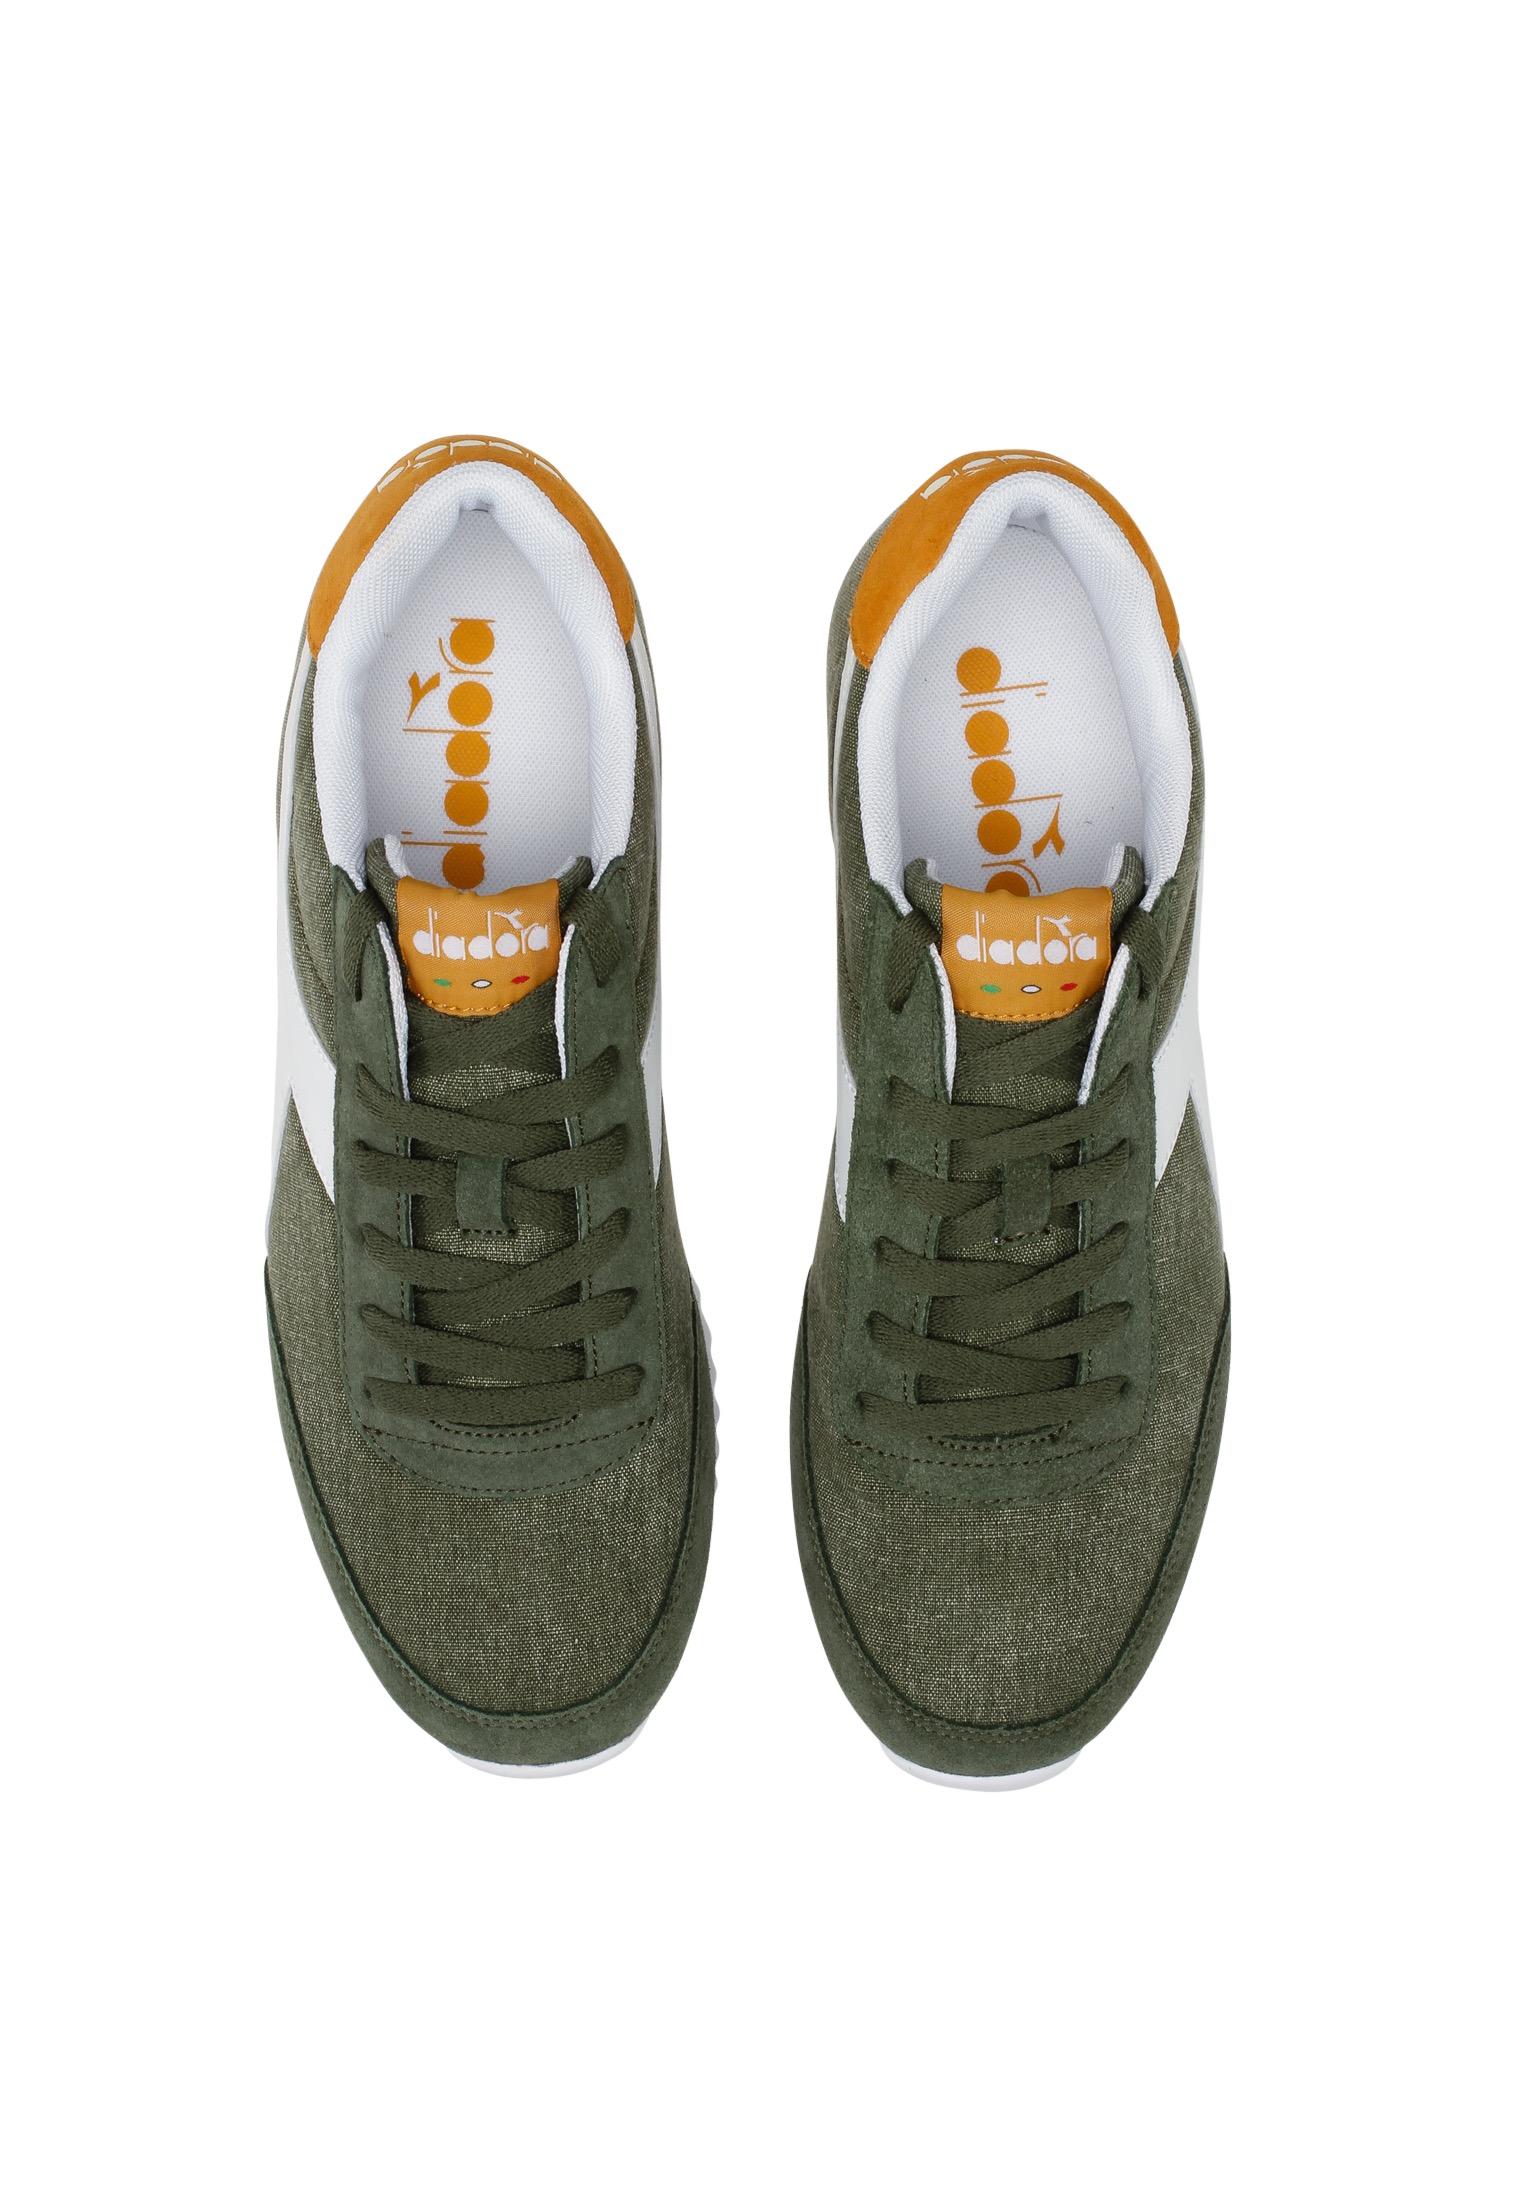 Scarpe-Diadora-Jog-Light-C-Sneakers-sportive-uomo-donna-vari-colori-e-taglie miniatura 41